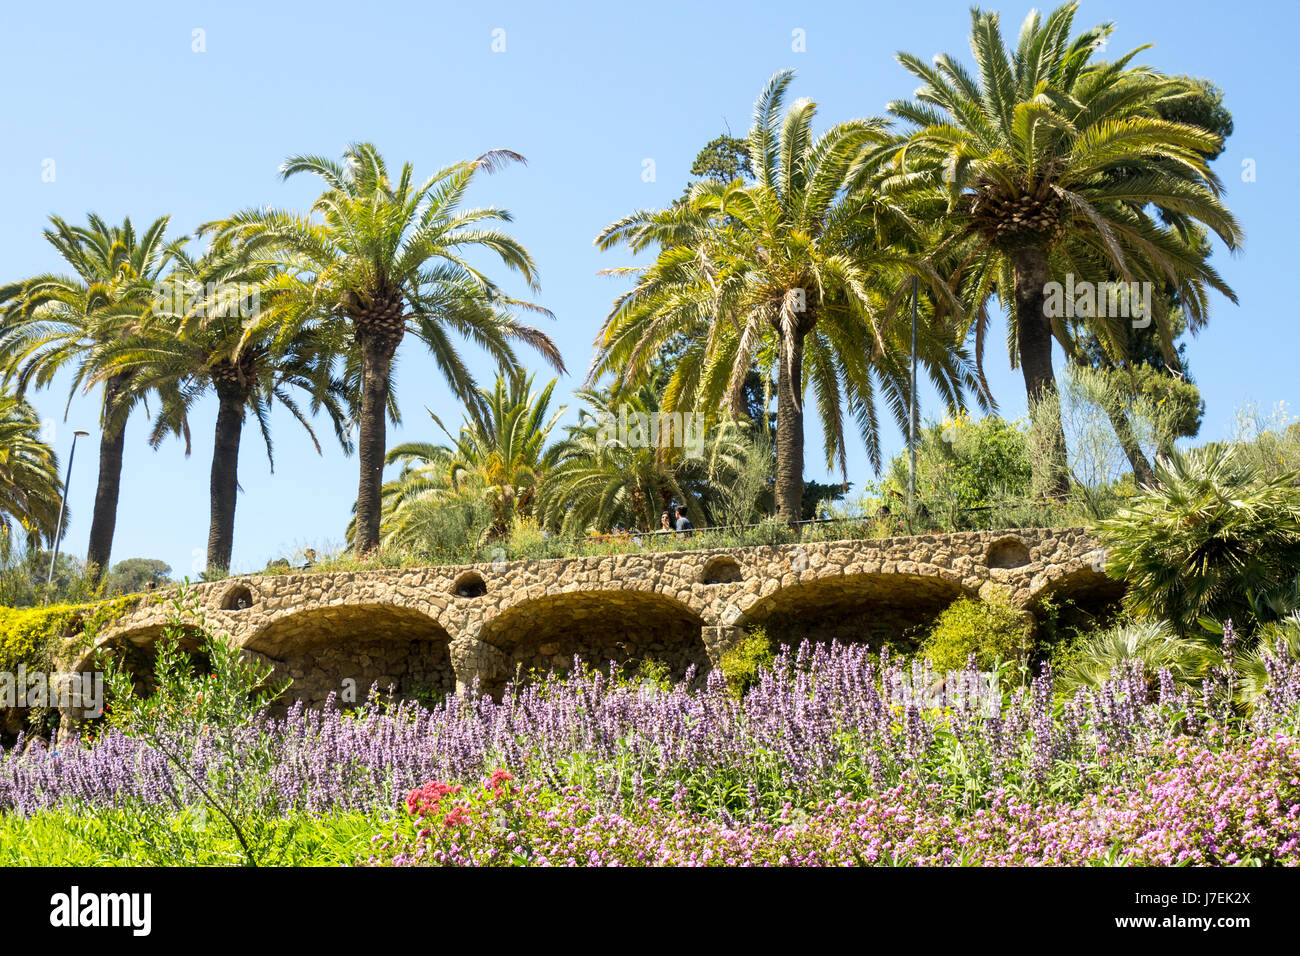 landscaped-garden-viaduct-and-palm-trees-in-antoni-gaudis-park-gell-J7EK2X.jpg